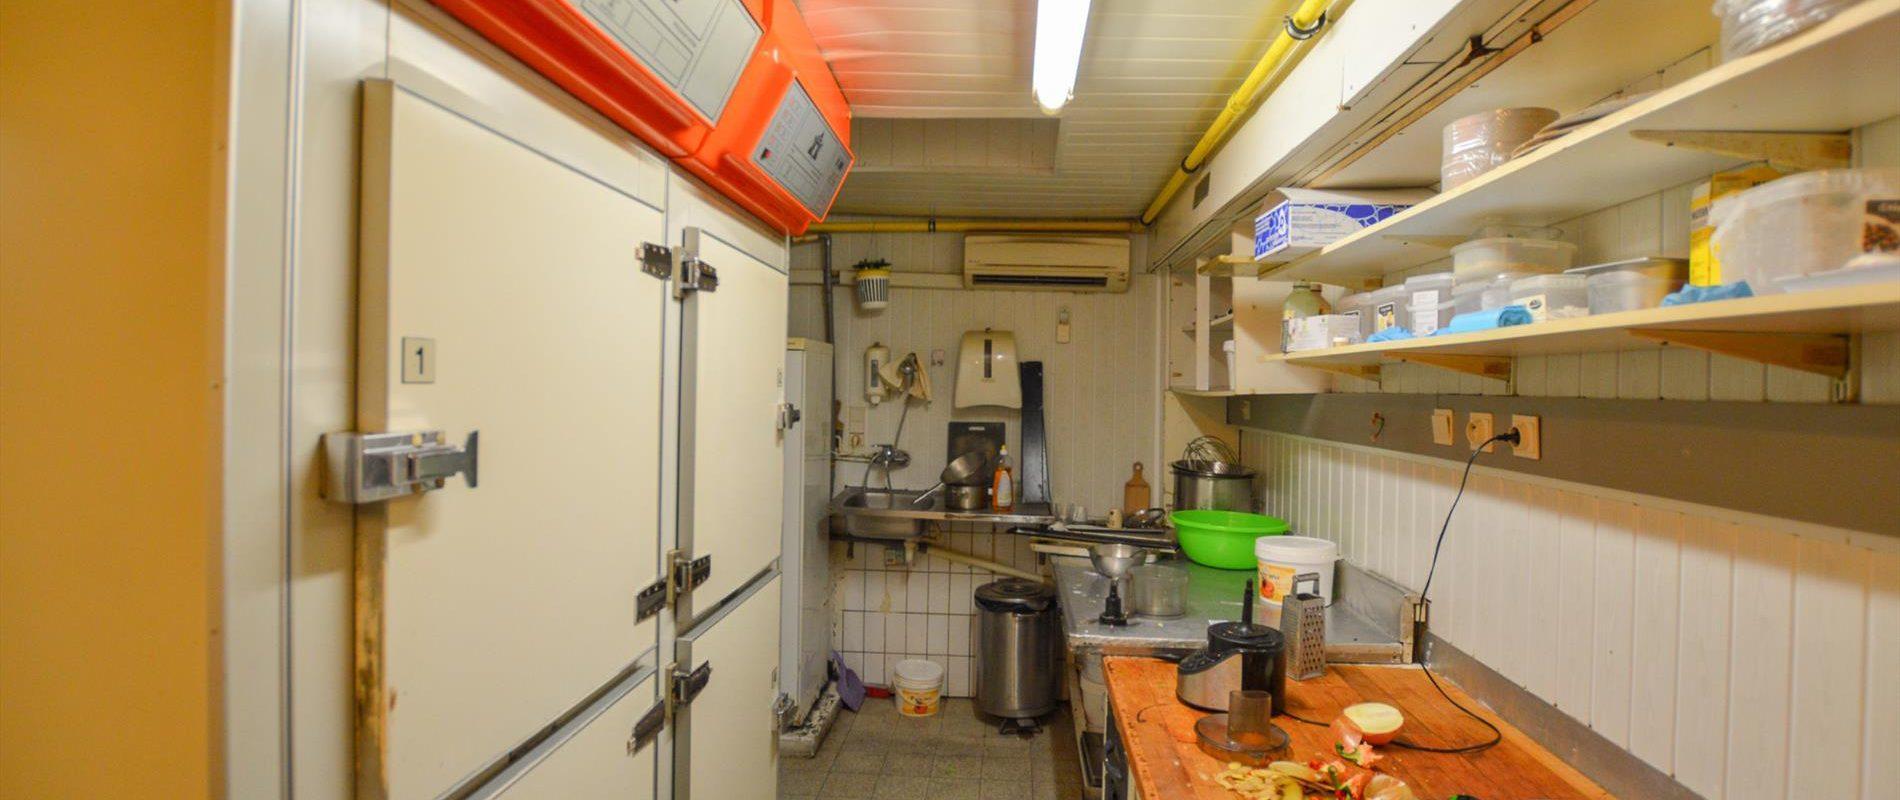 Beleggingsobject: Oostende, Torhoutsesteenweg 73